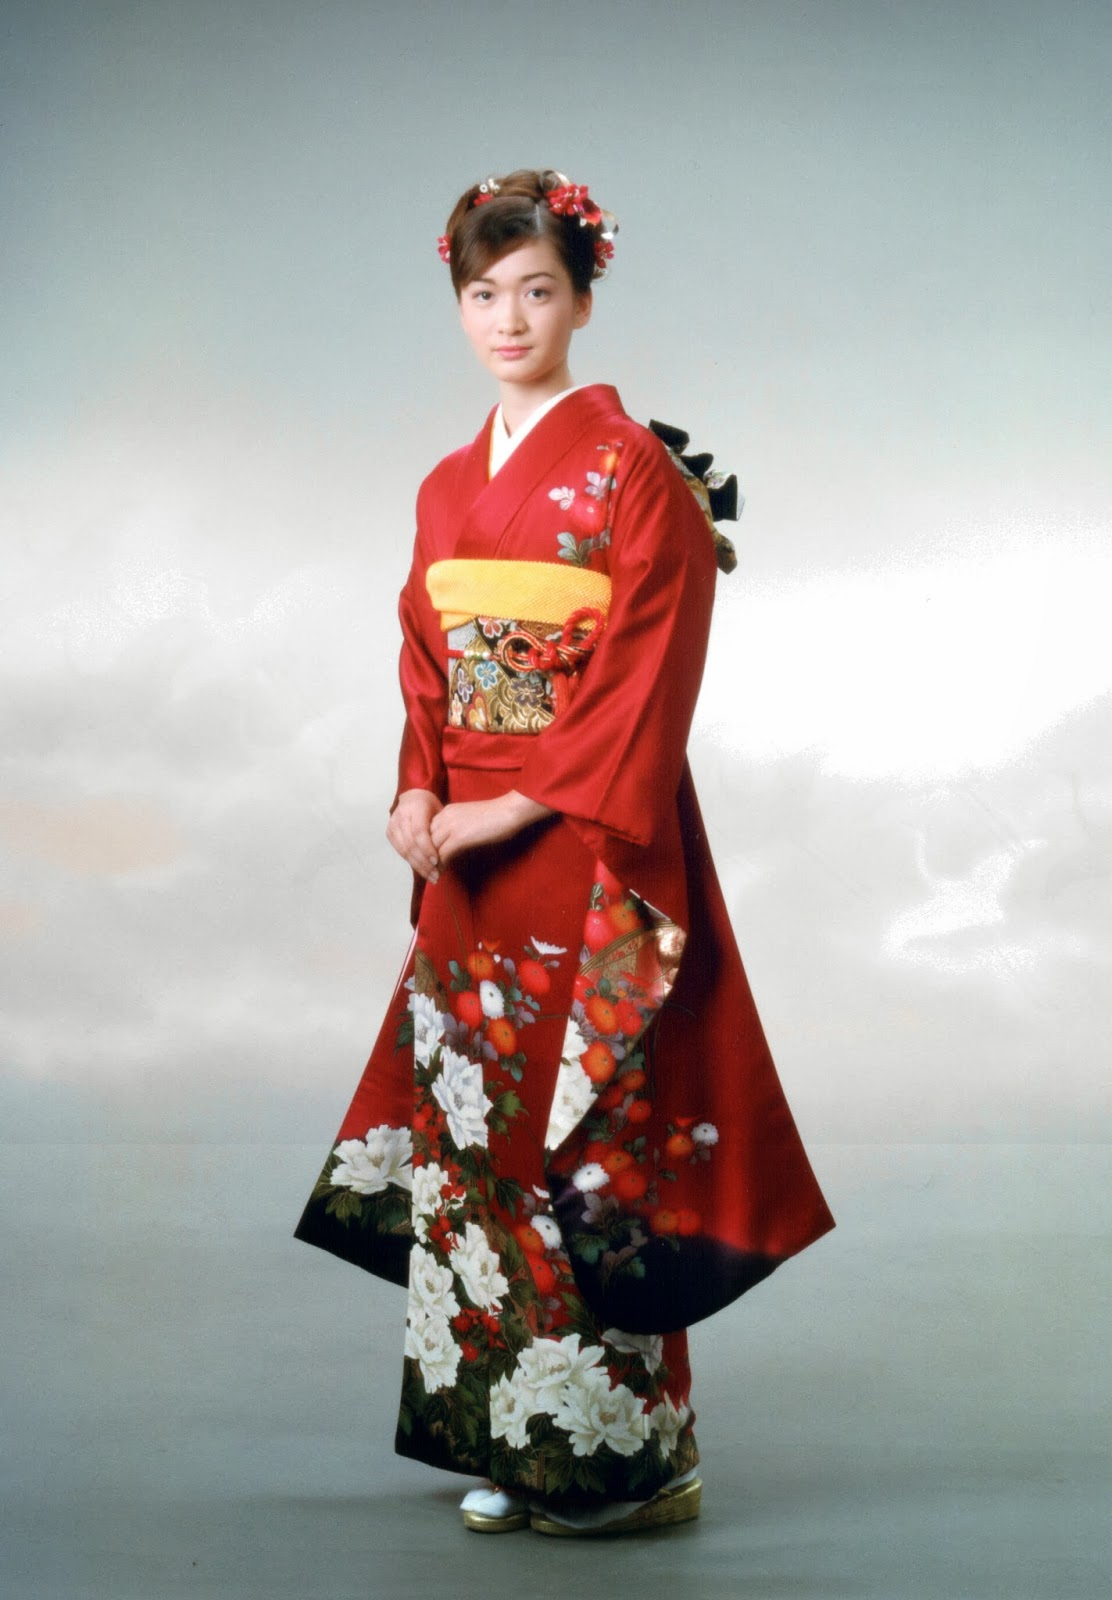 All About Japan: Kimono